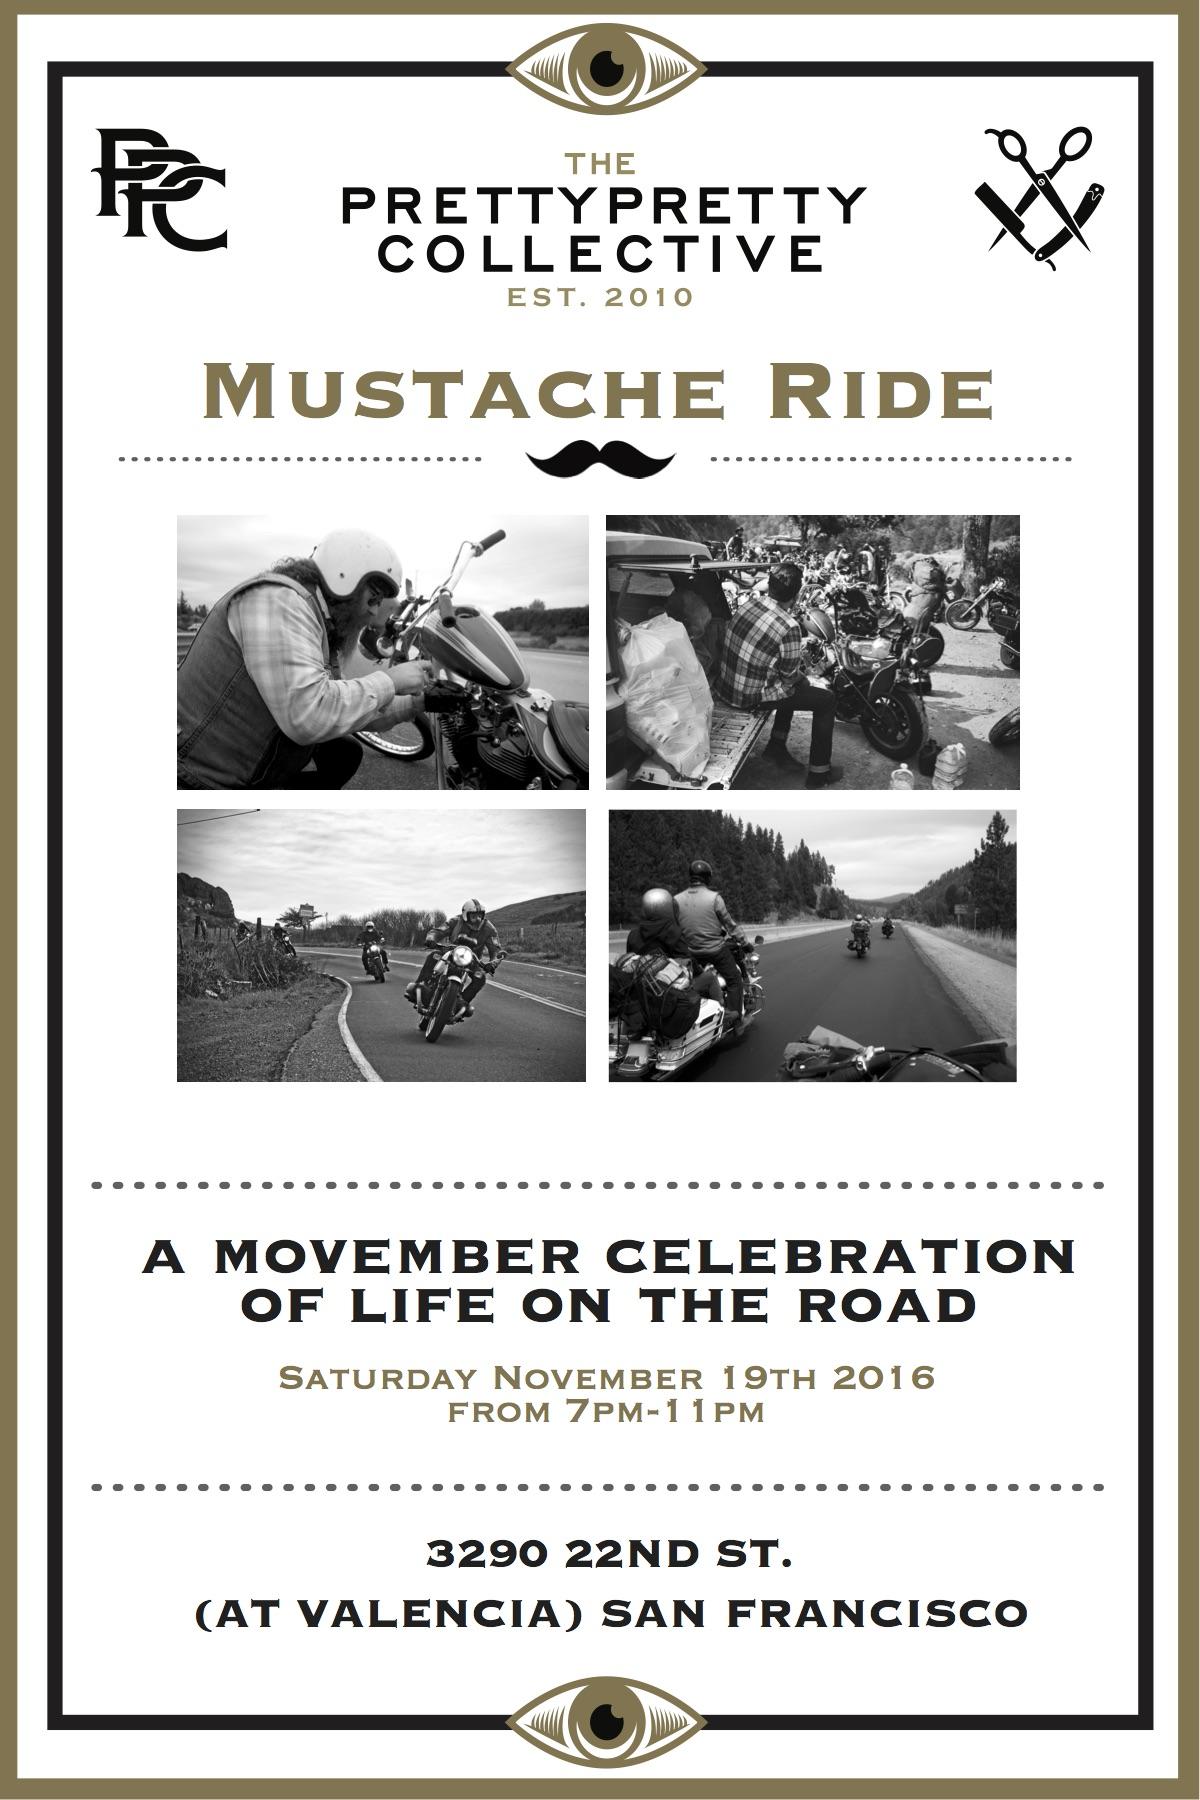 Mustache Ride Group Photo Show